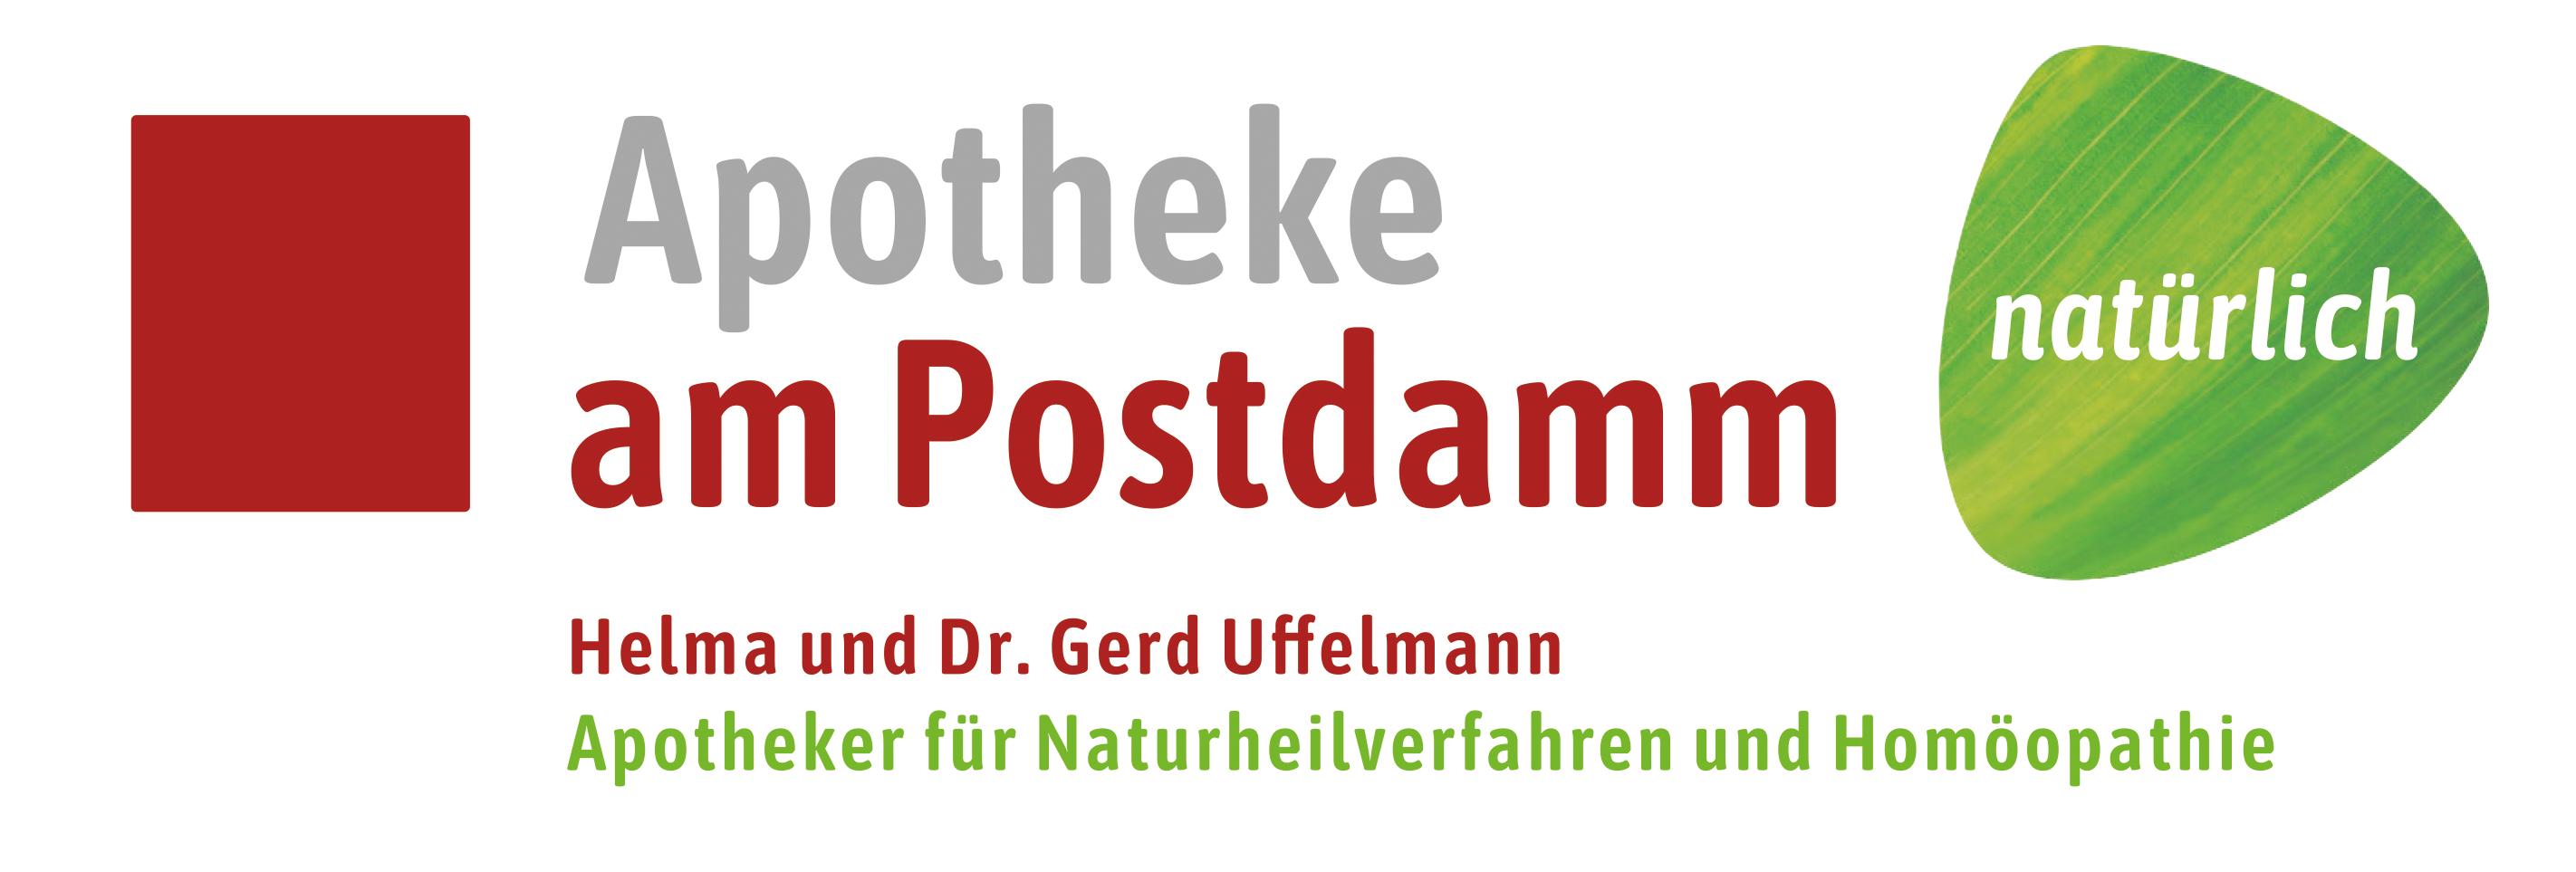 Logo der Apotheke am Postdamm